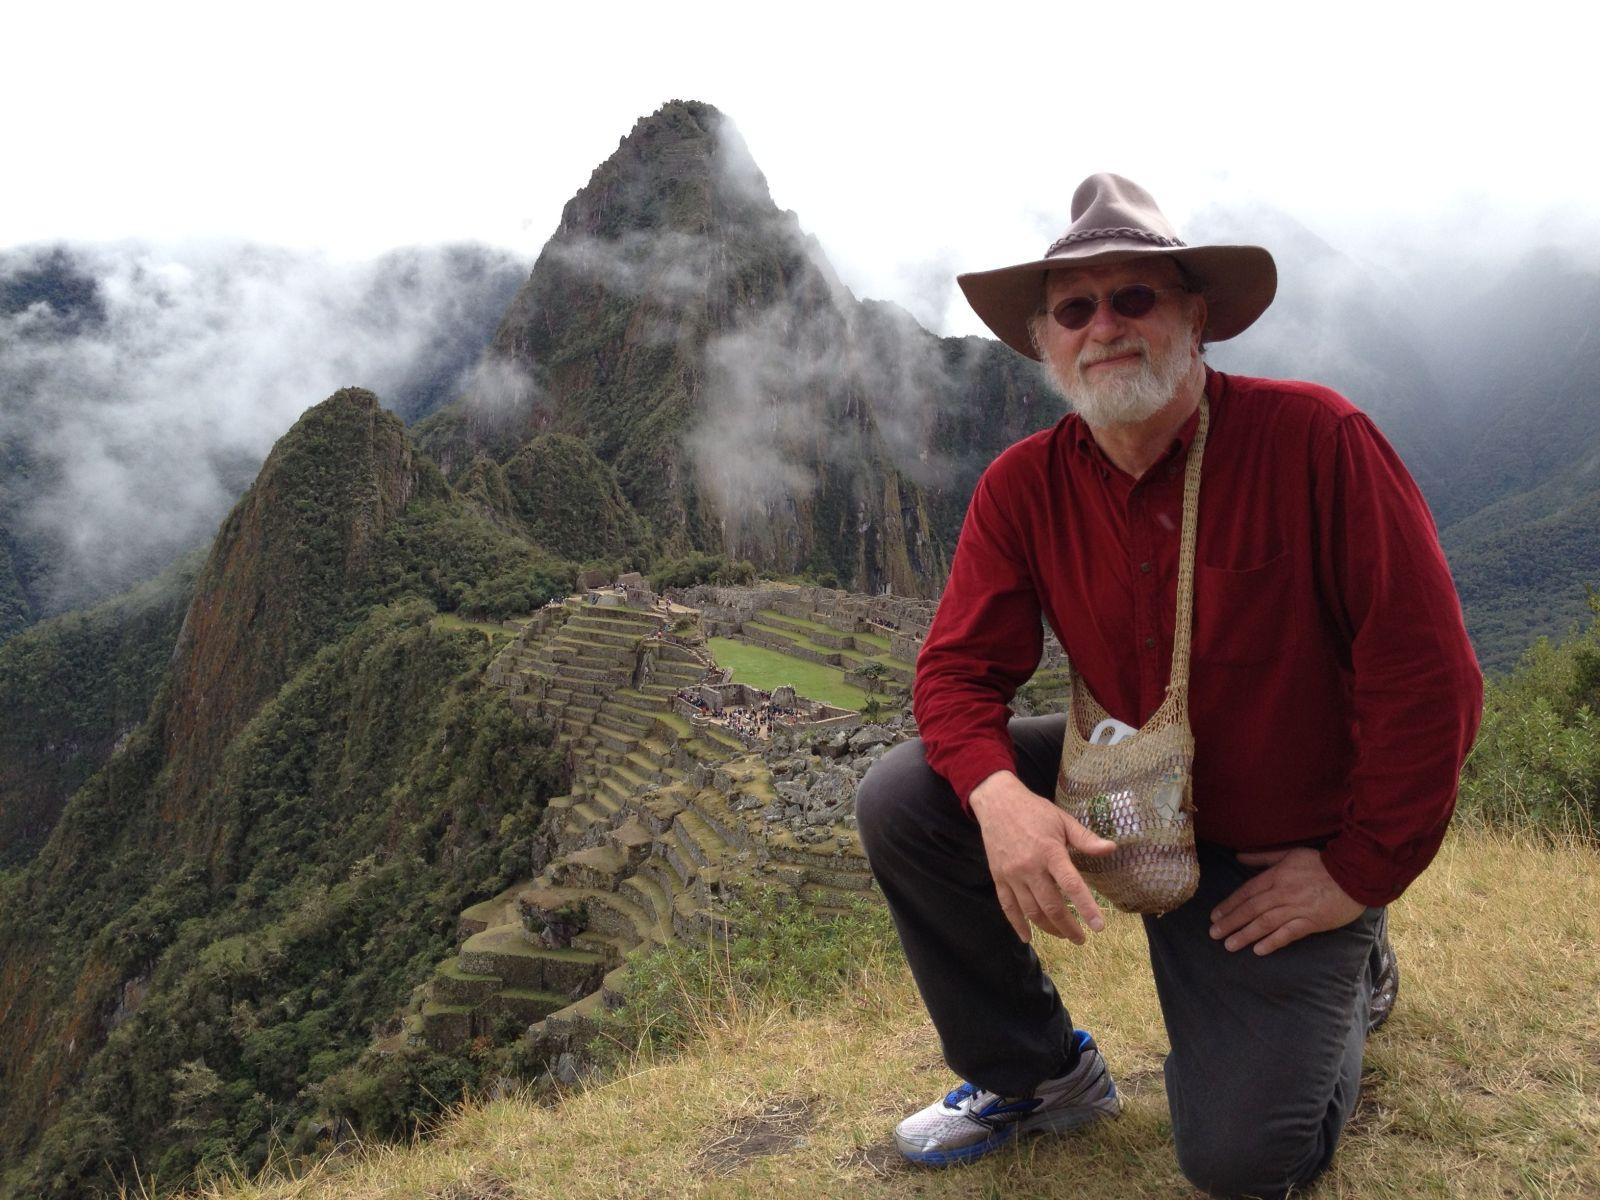 Dennis McKenna - psychedelics and plant medicine